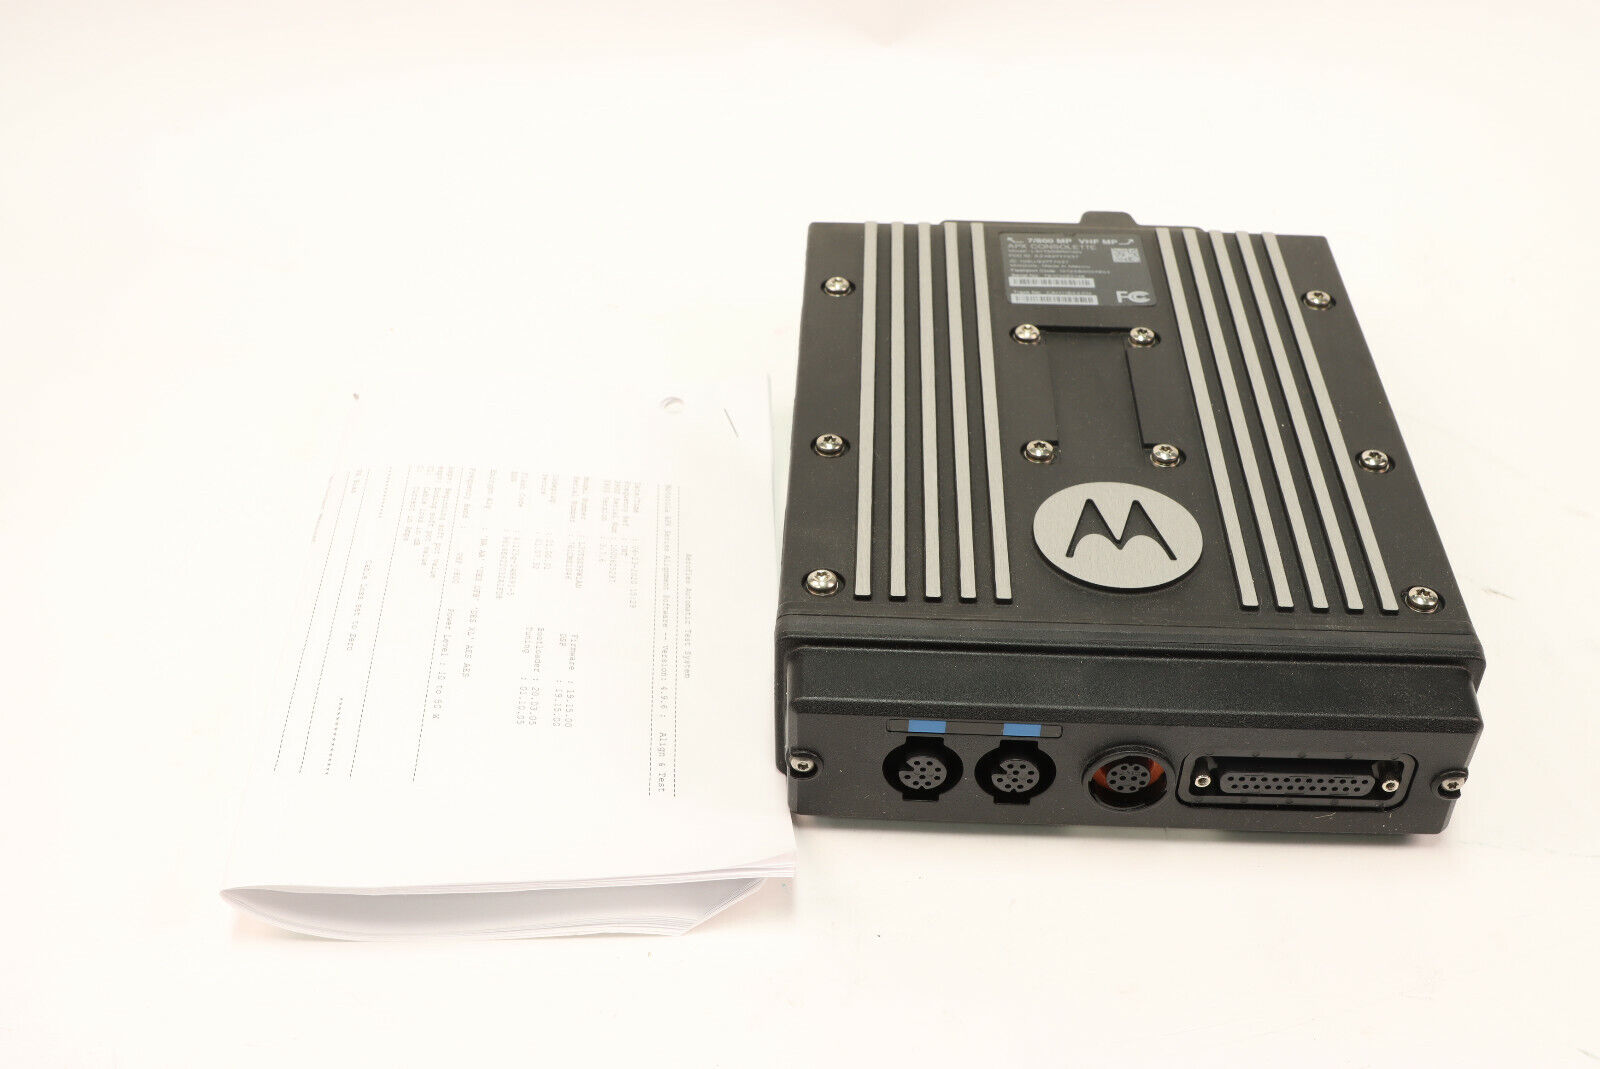 Motorola APX7500 VHF - 7/800 Astro P25 (5) Algos *Brick Only. Buy it now for 2650.00